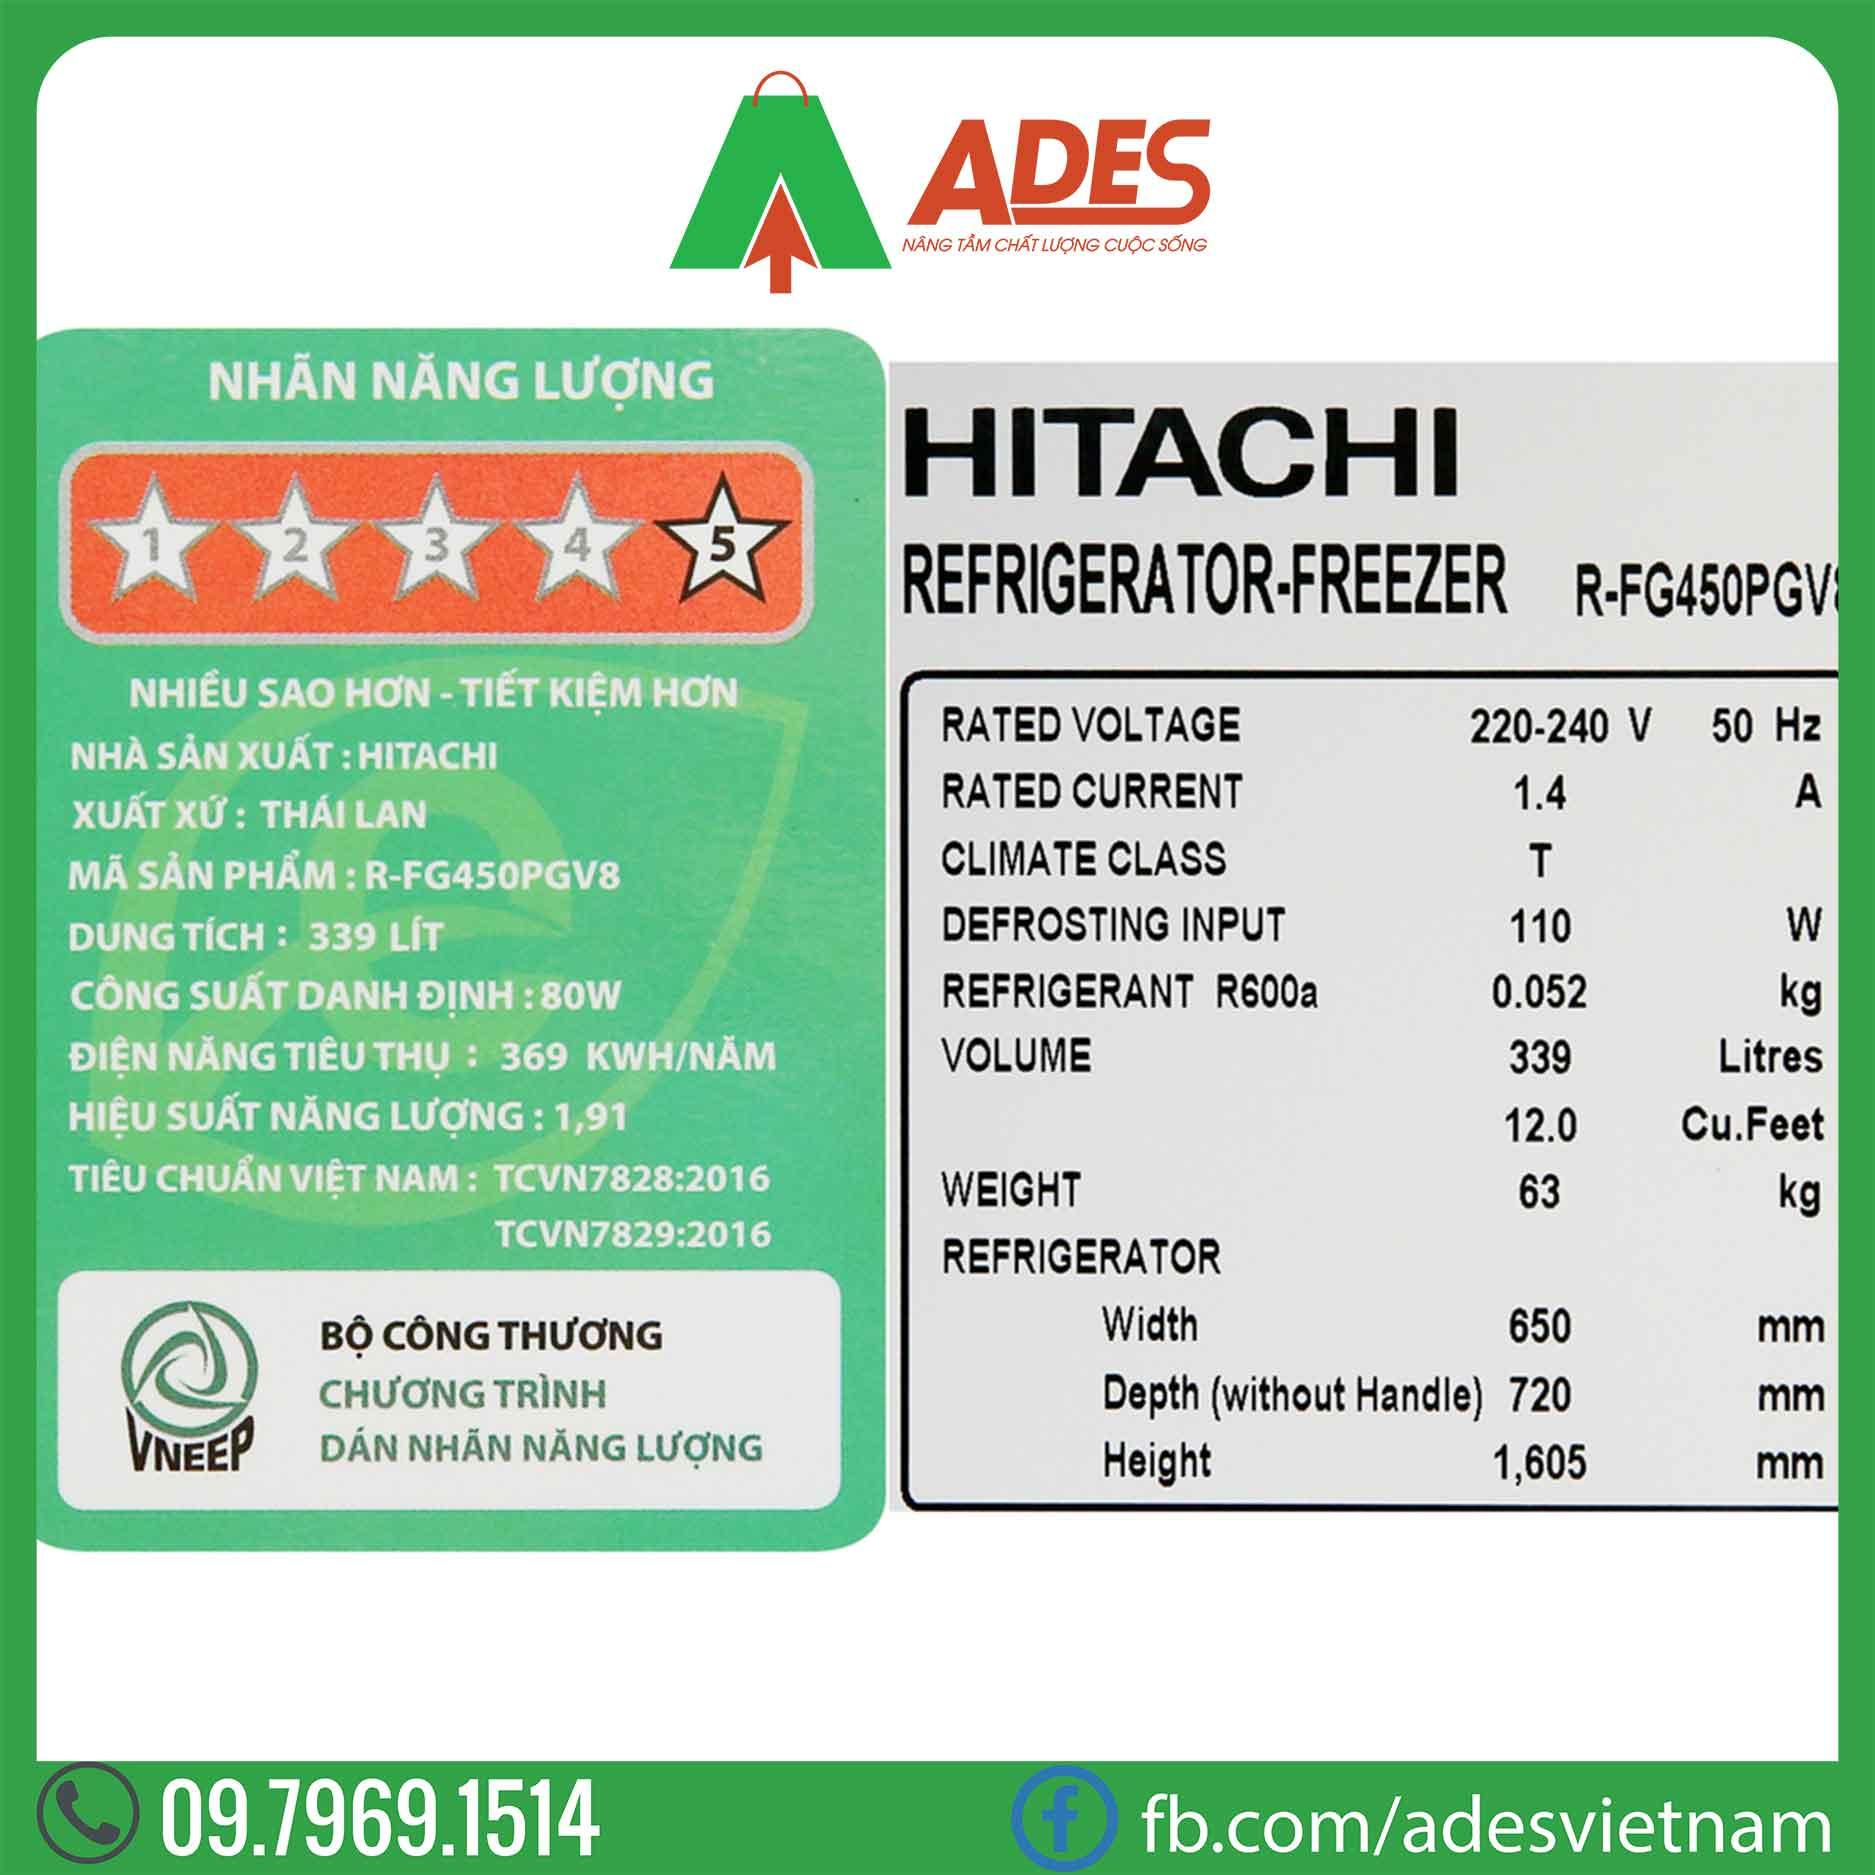 Tu lanh Hitachi Inverter R-FG450PGV8 GBK